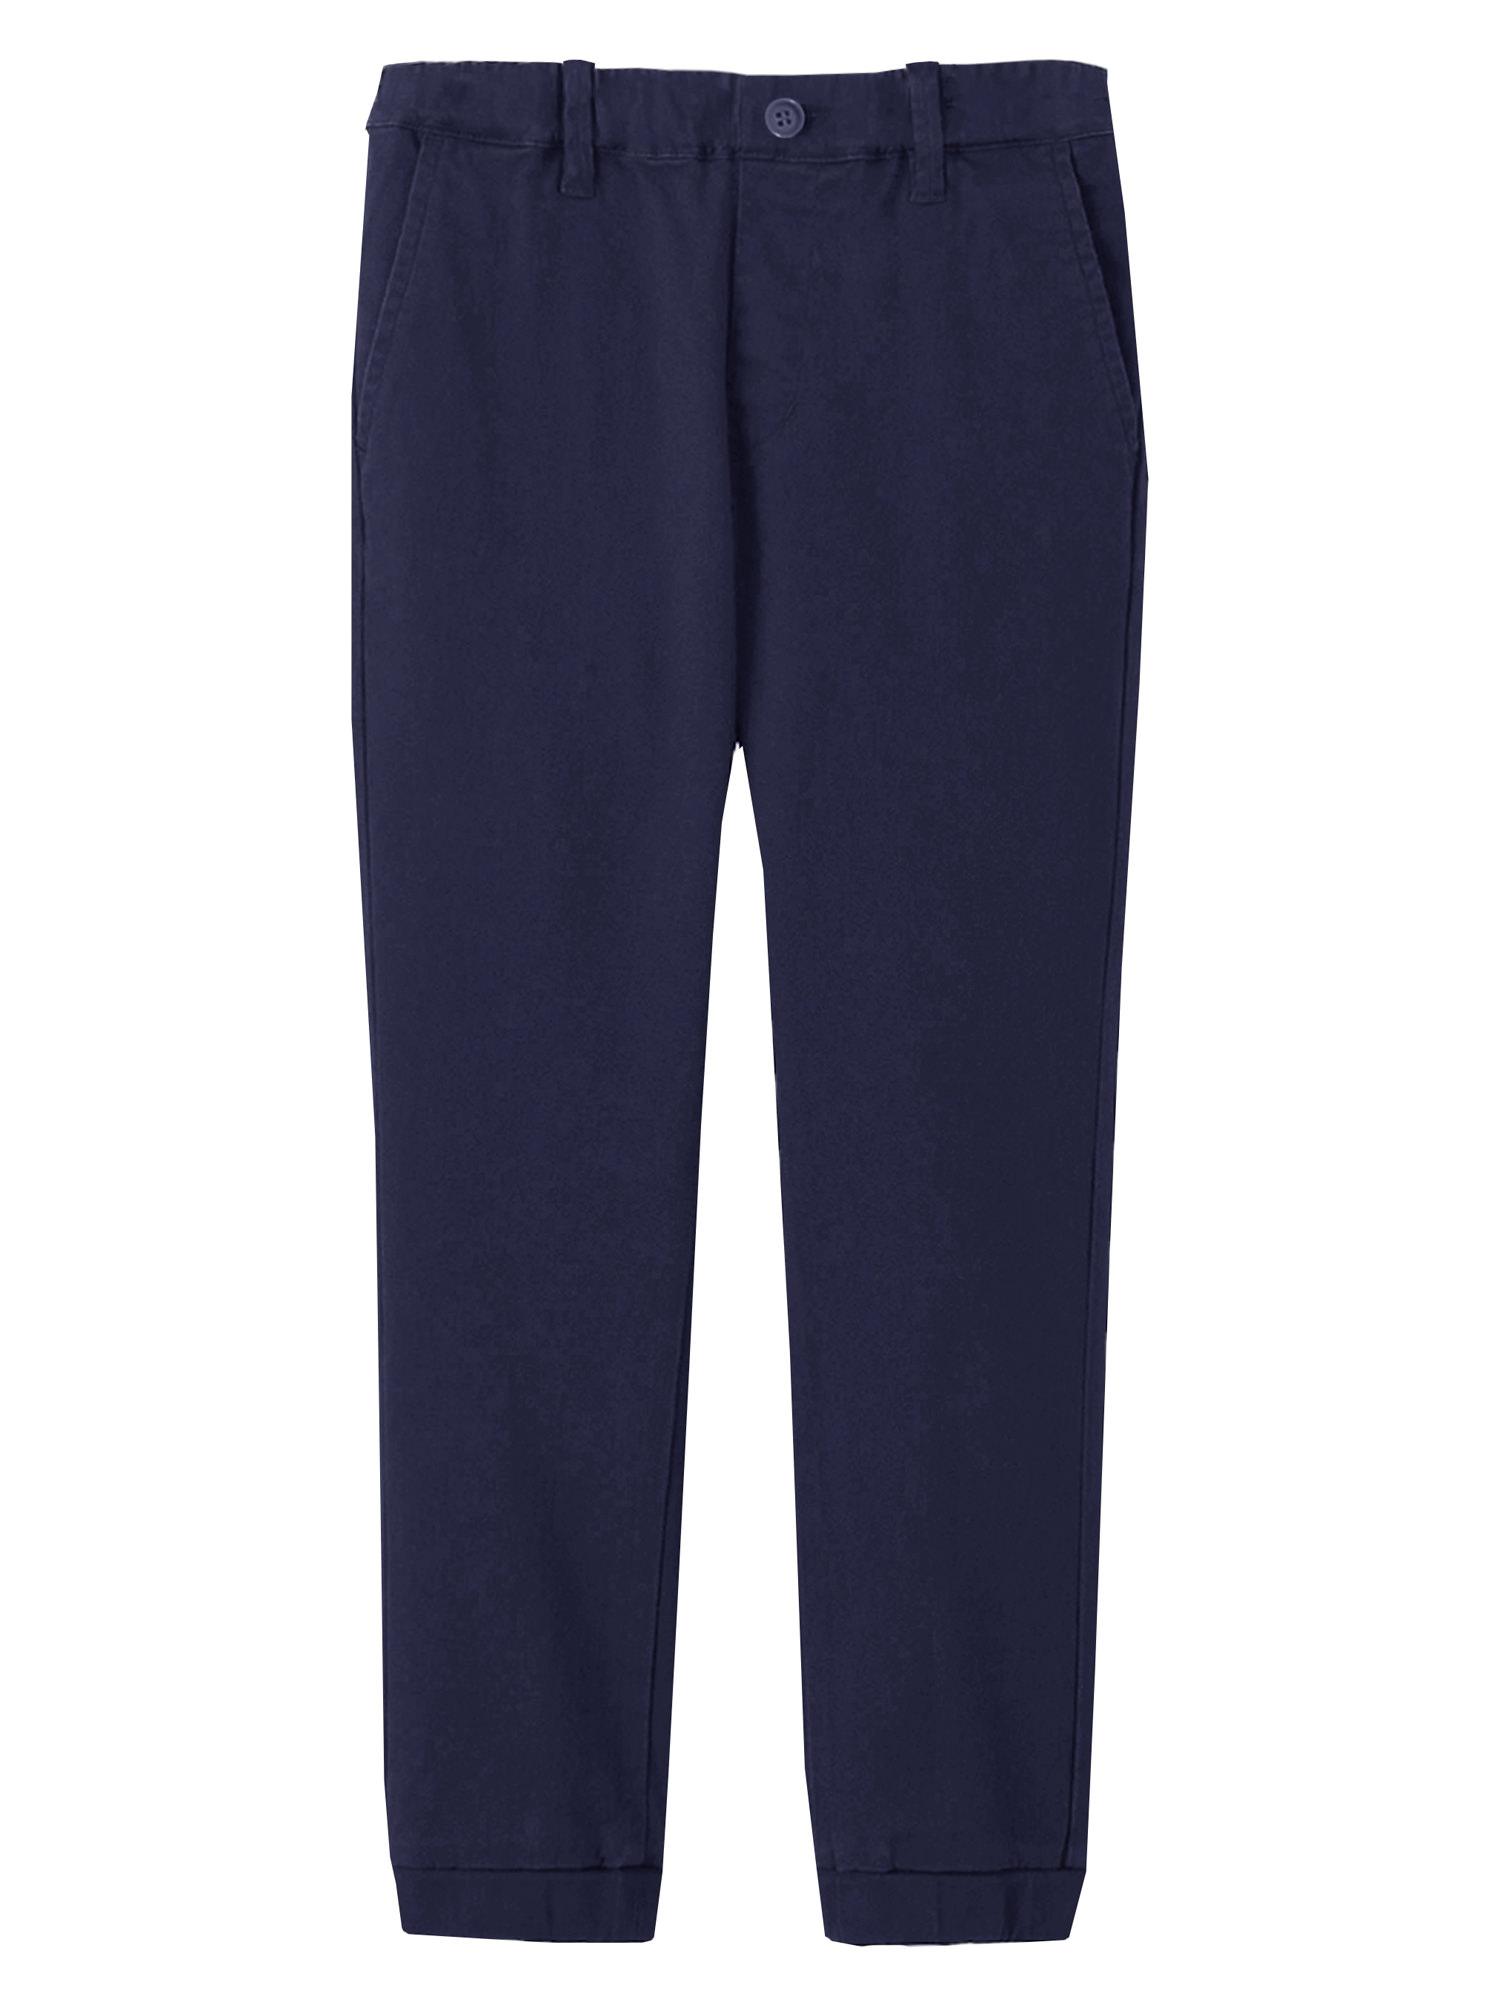 Children & Boys Joggers Casual Twill Pants Dress School Uniform - Sizes 4-20